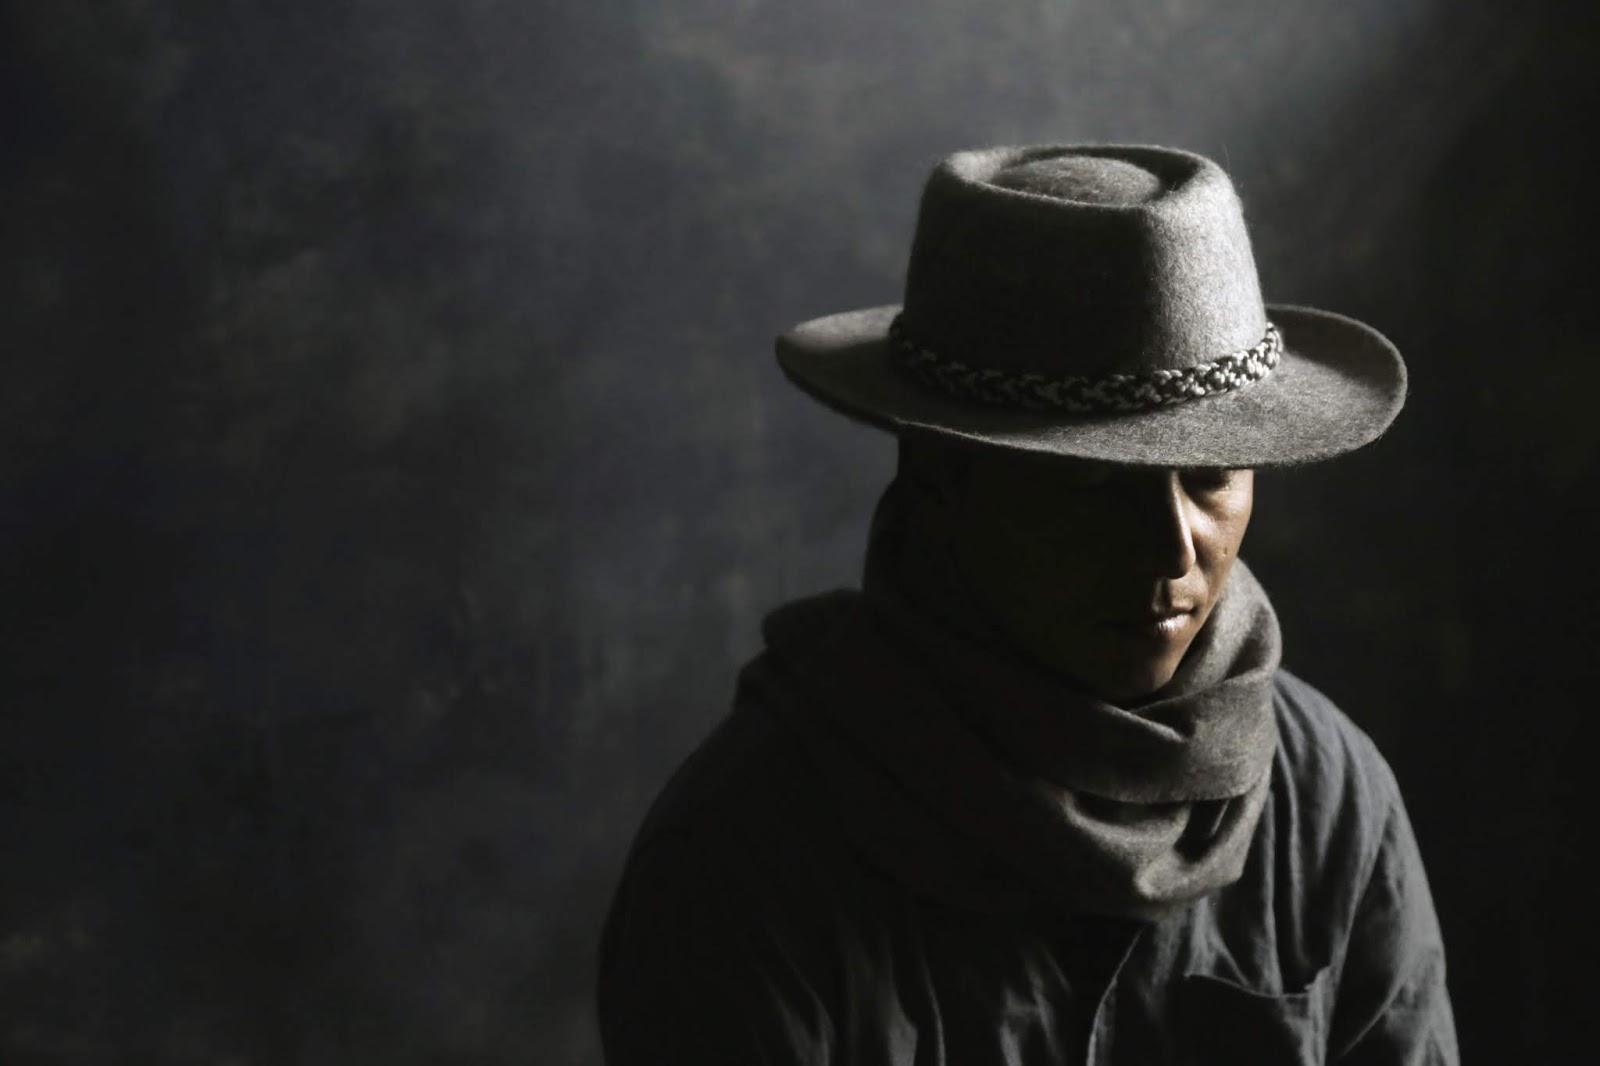 Grey Cowboy Felt Hat | SHANGDROK